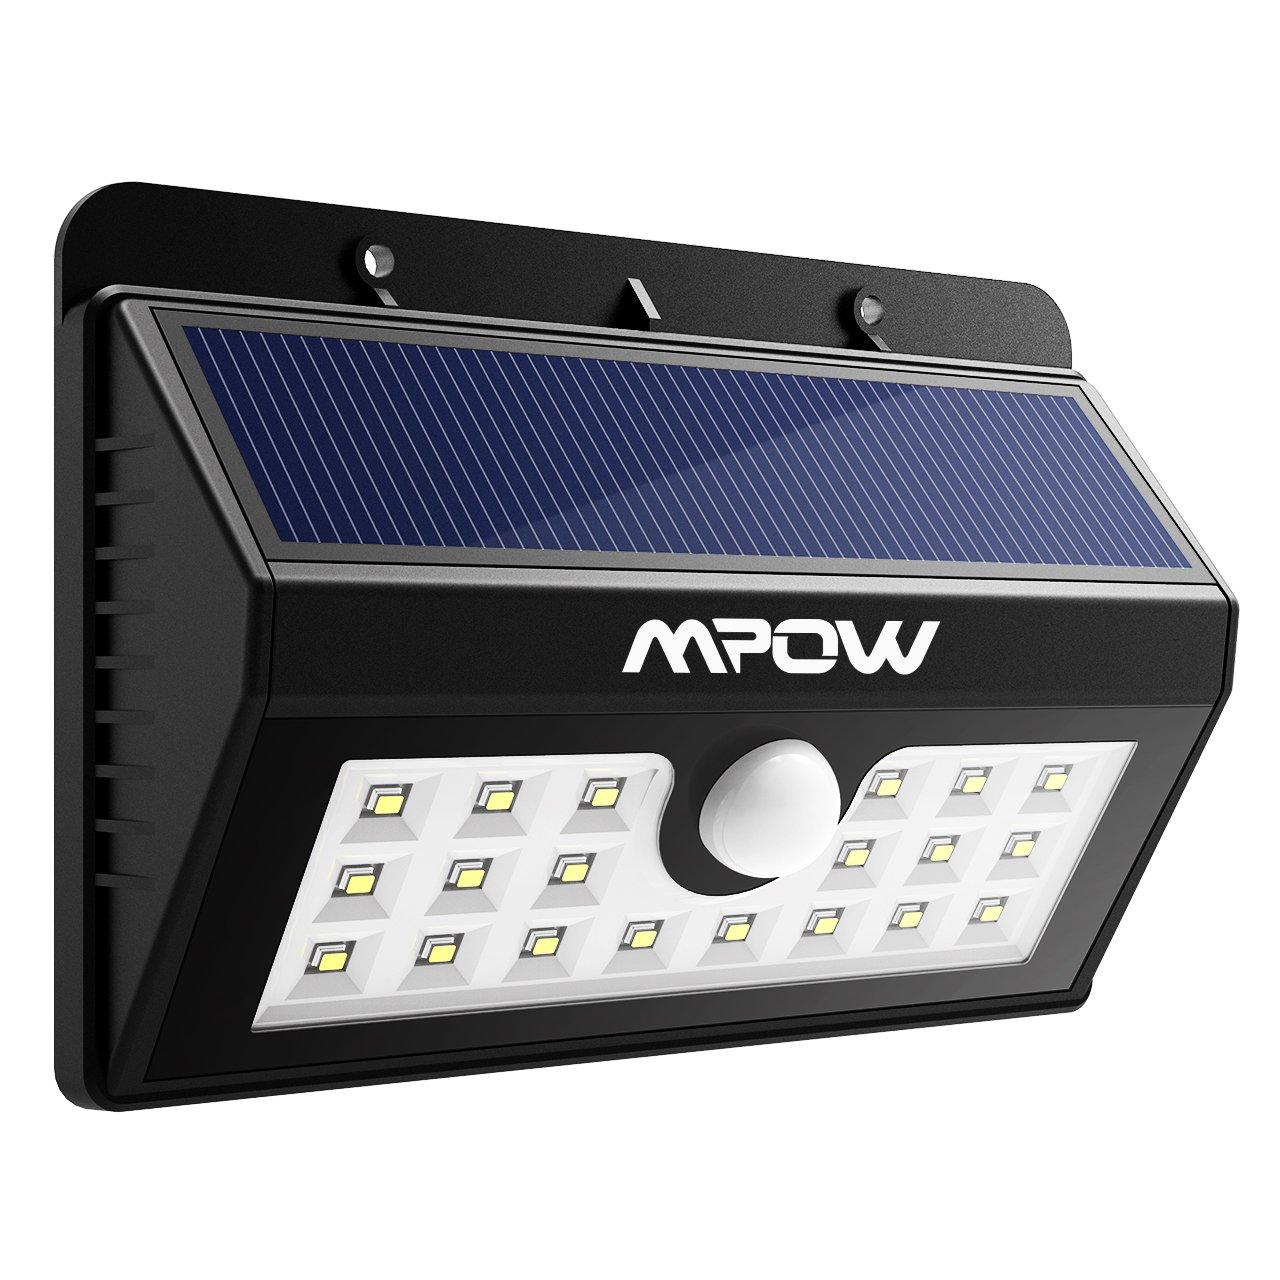 Outdoor security lighting amazon solar lights mpow 20 led motion sensor security lights home security solar lights 3 aloadofball Choice Image